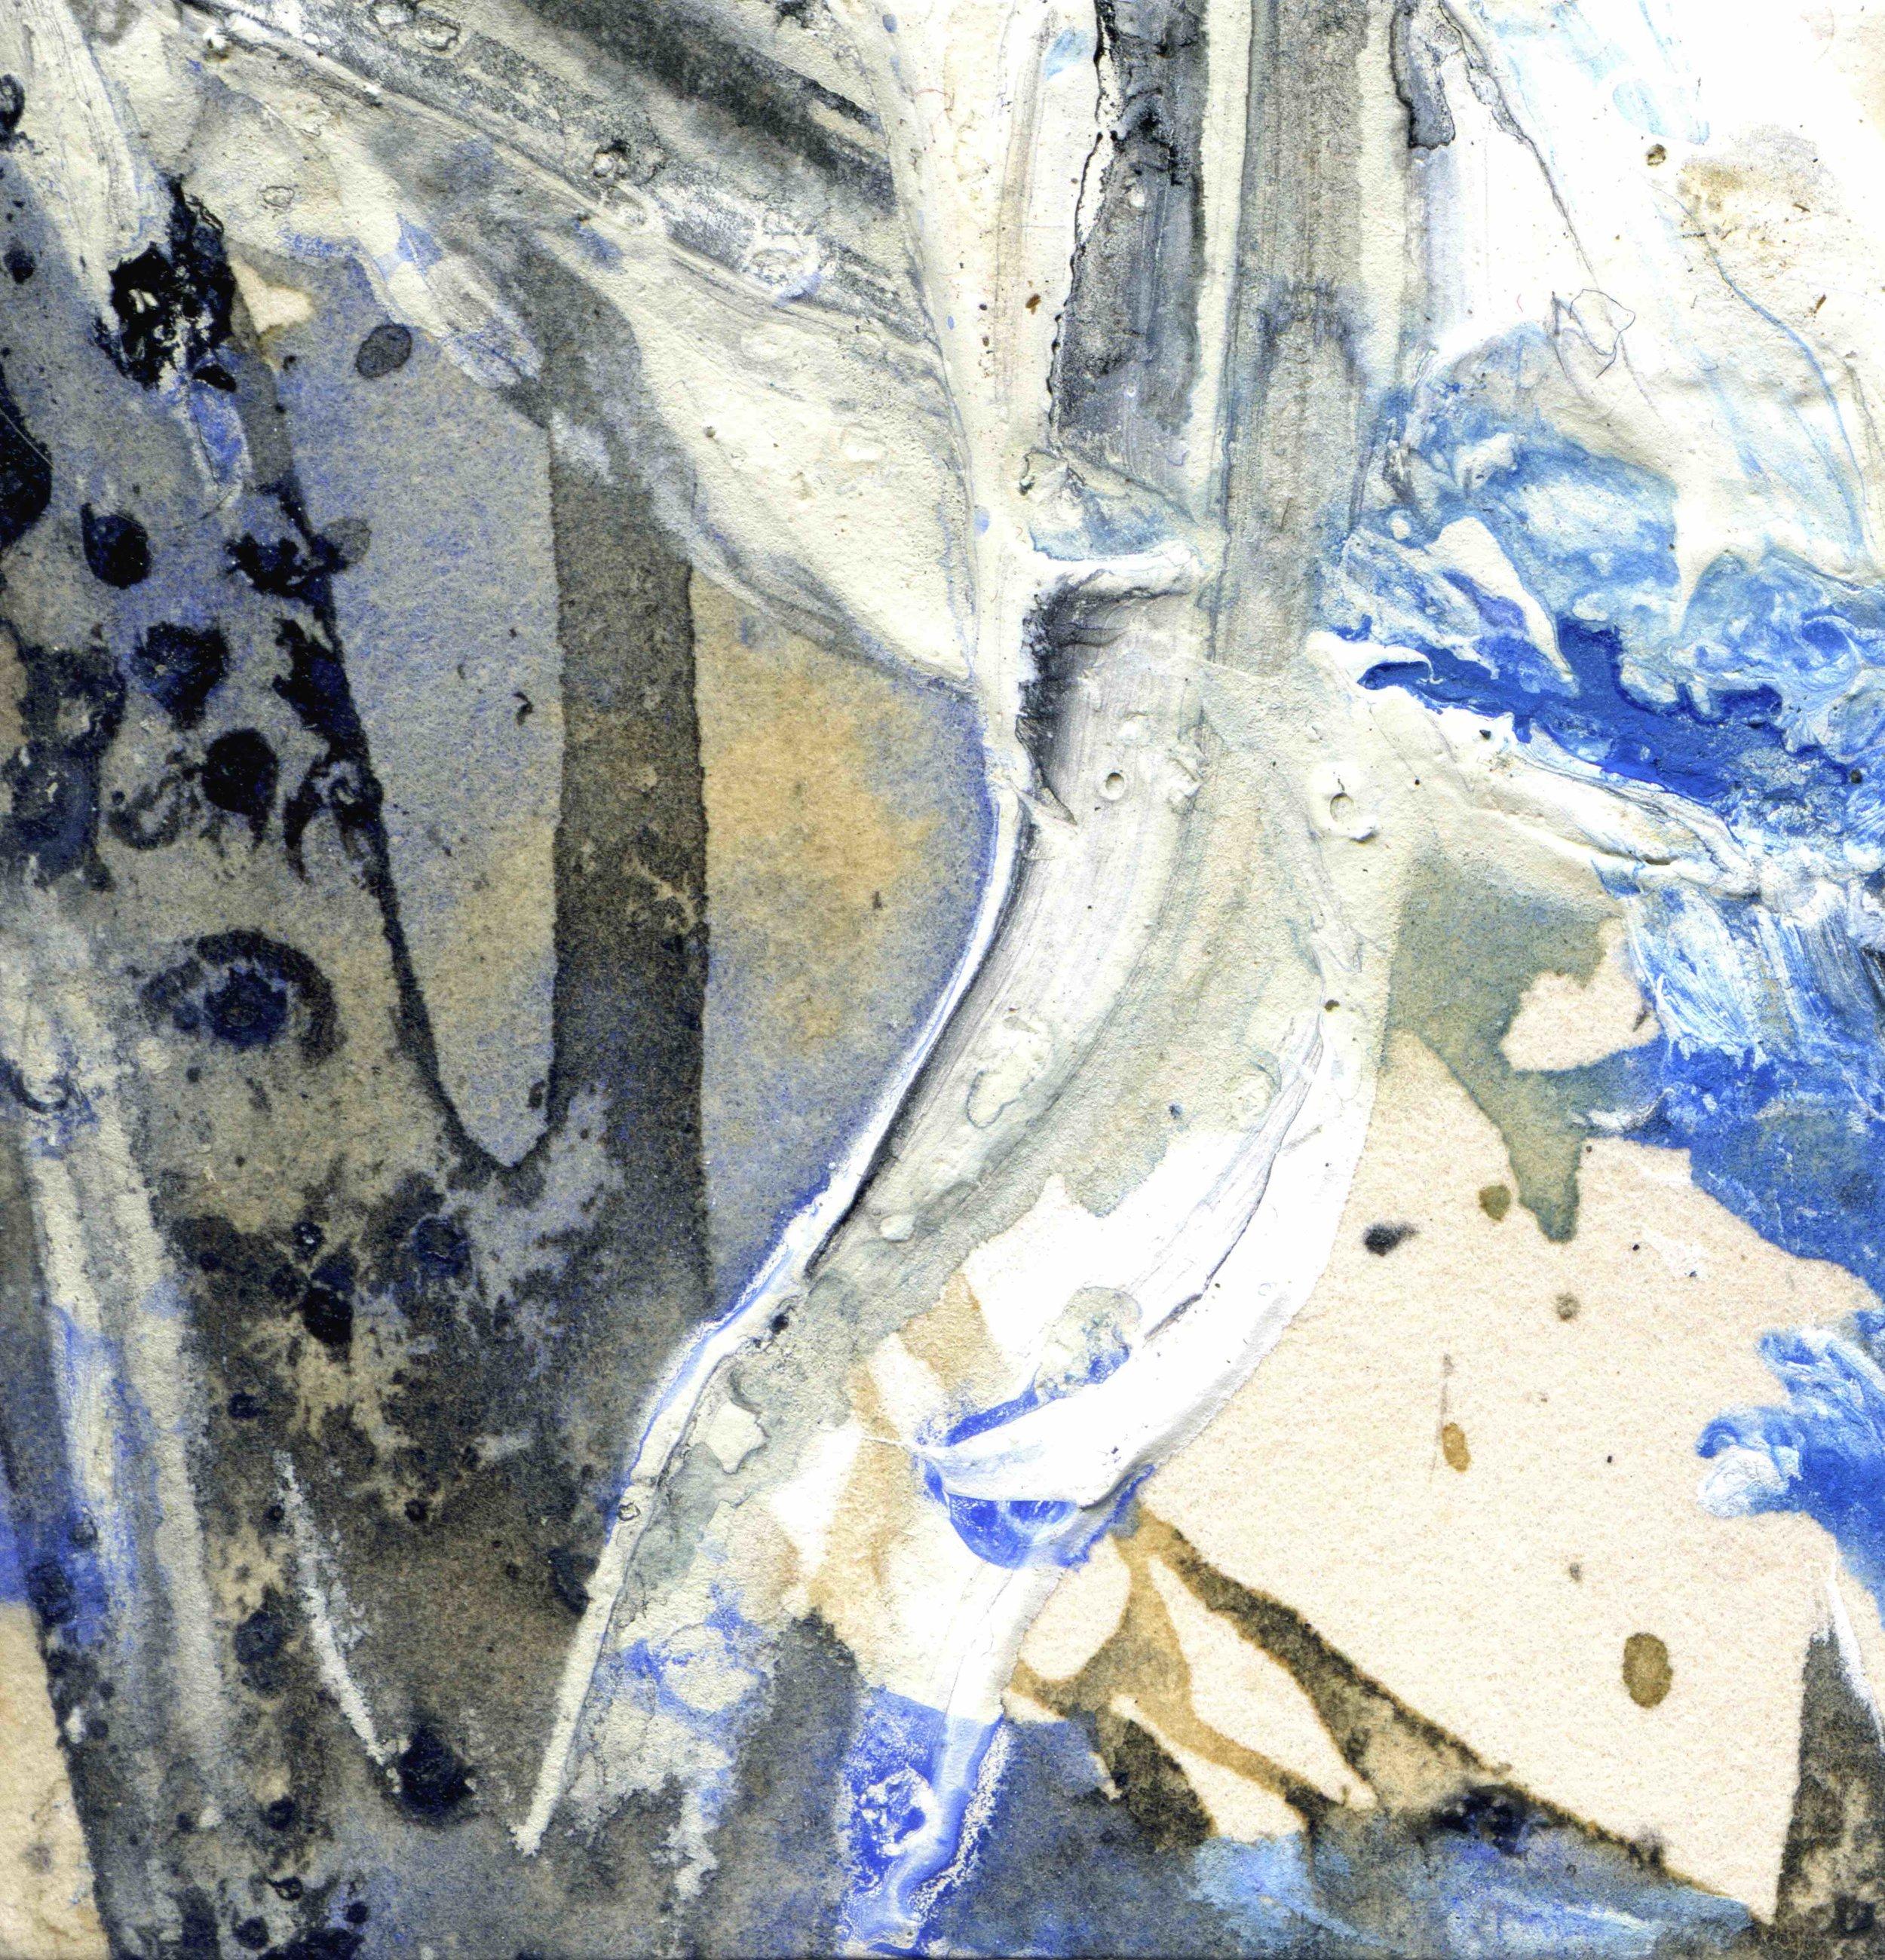 Hawkesbury River Series : A : digital print on Hanumuhle art paper